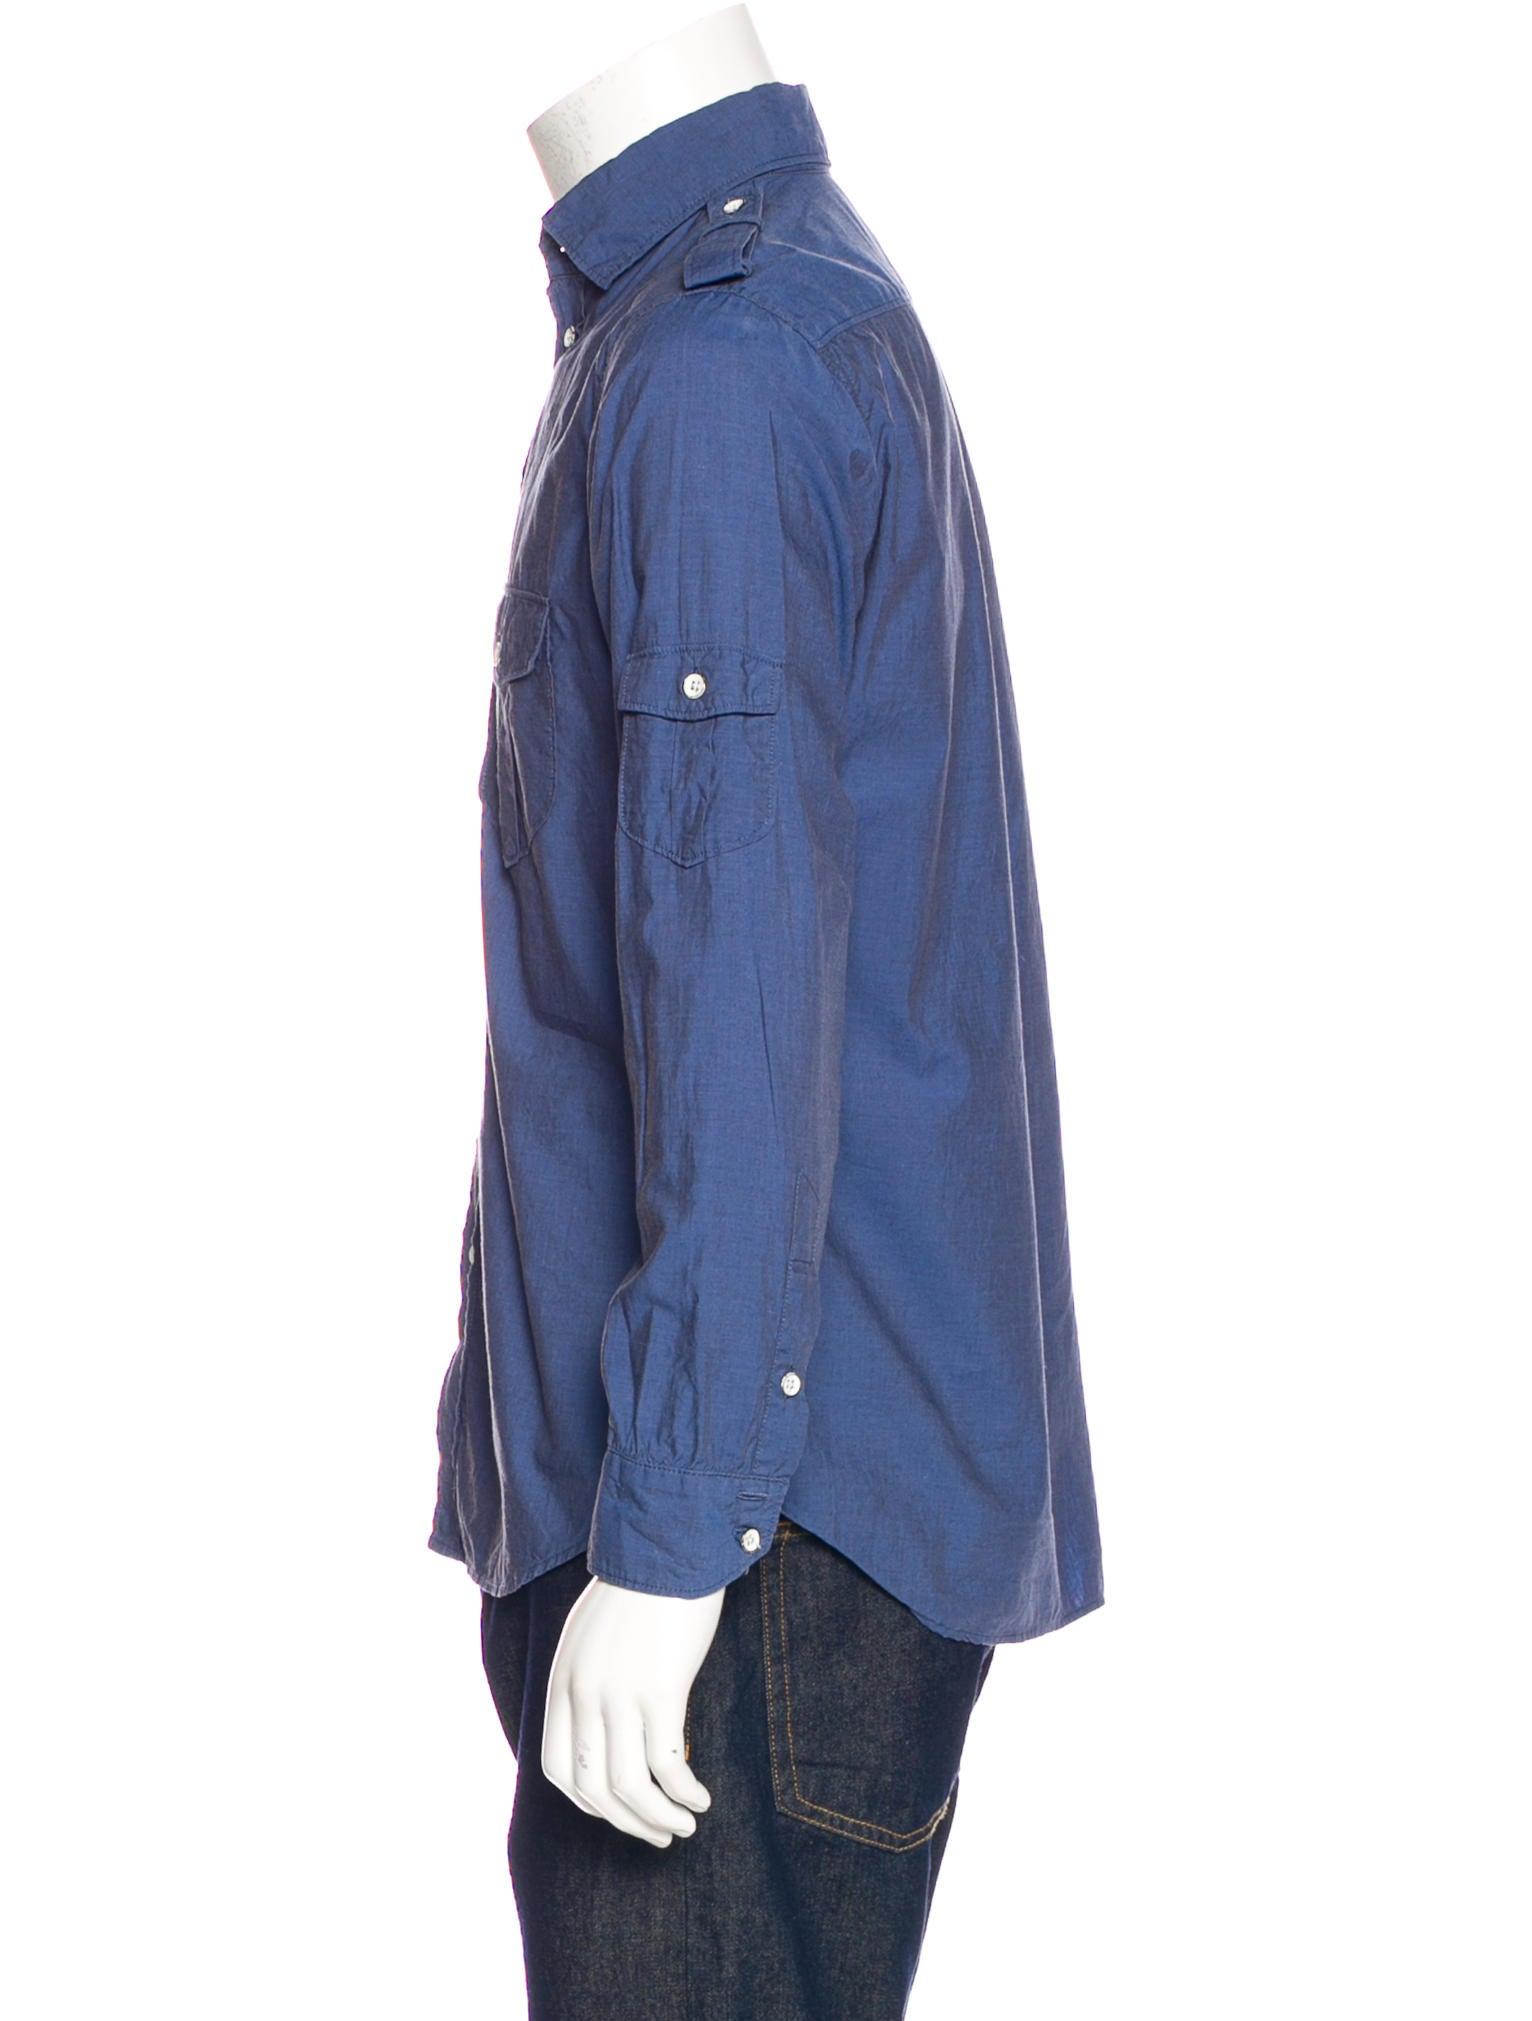 Rag bone utility button up shirt clothing wragb83365 for Rag and bone mens shirts sale